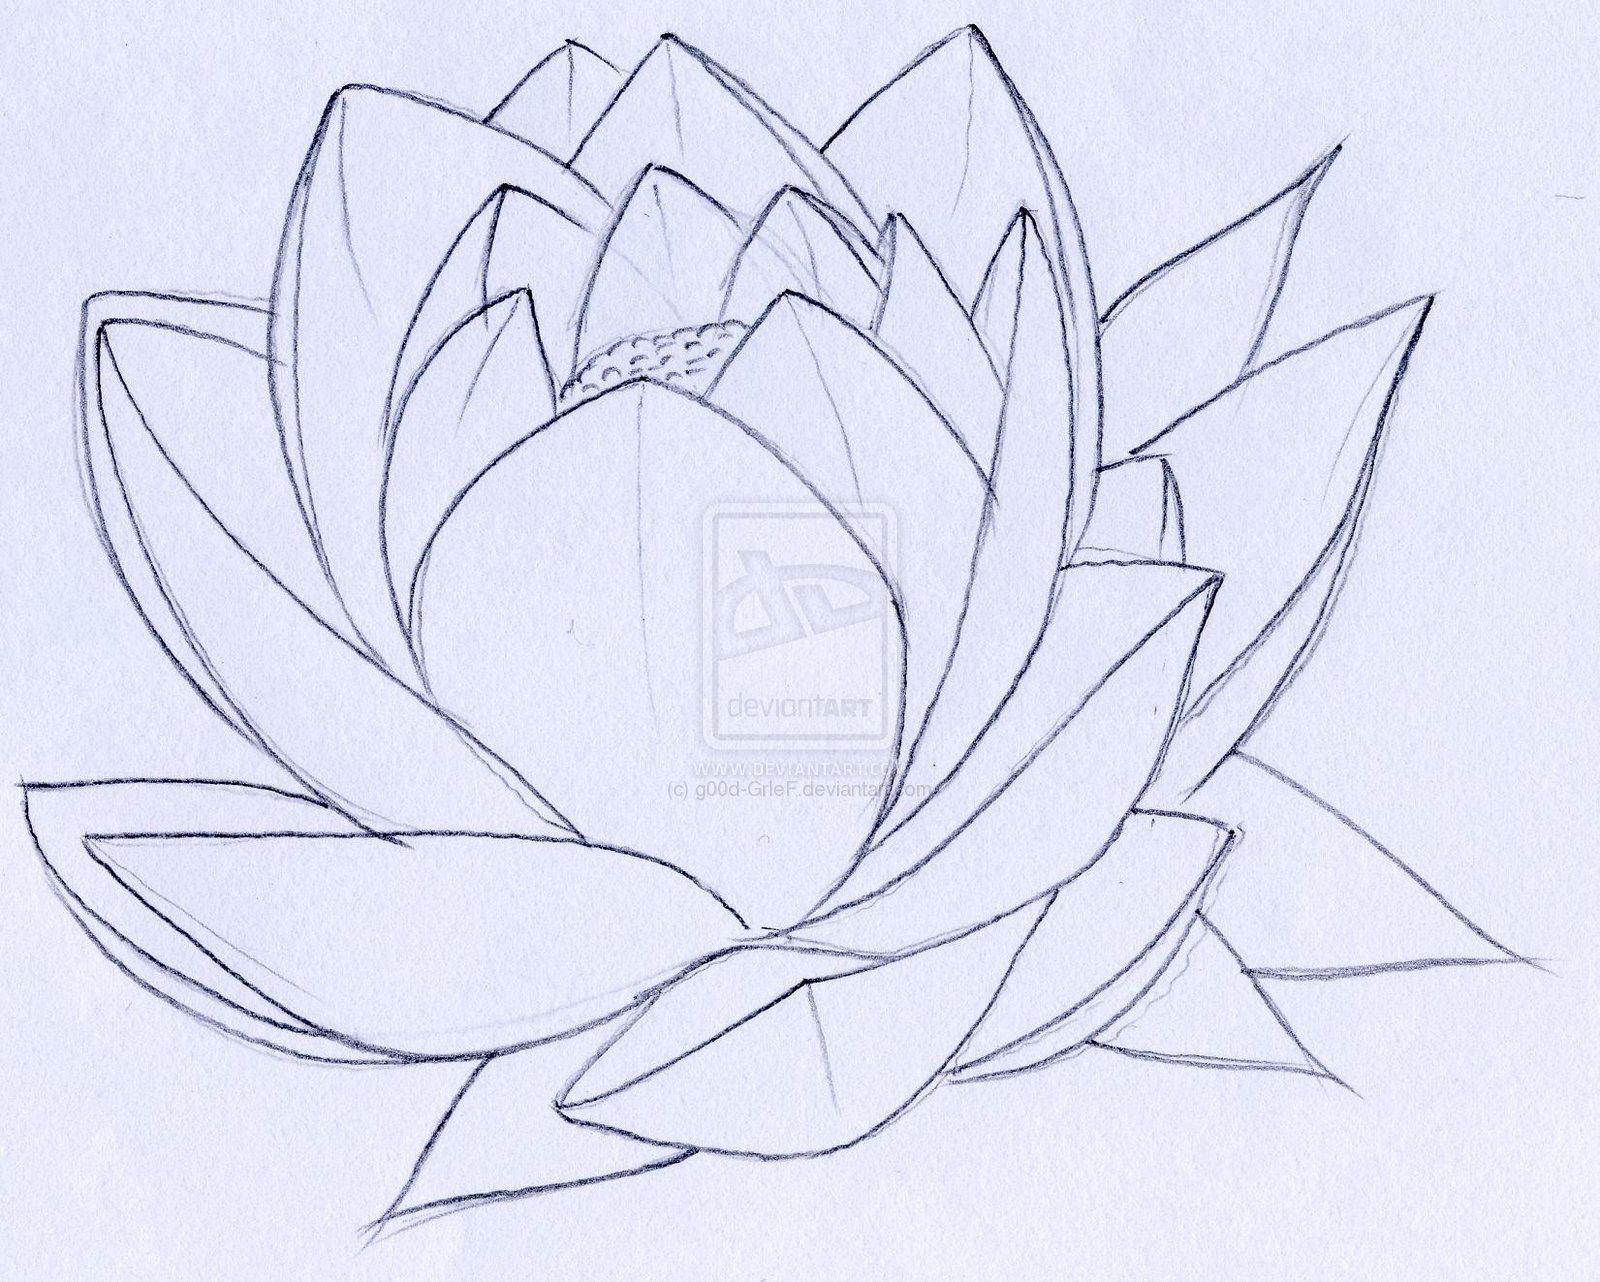 Blooming lotus designs women s - Lotus Tattoo By G00d Grief Deviantart Com On Deviantart